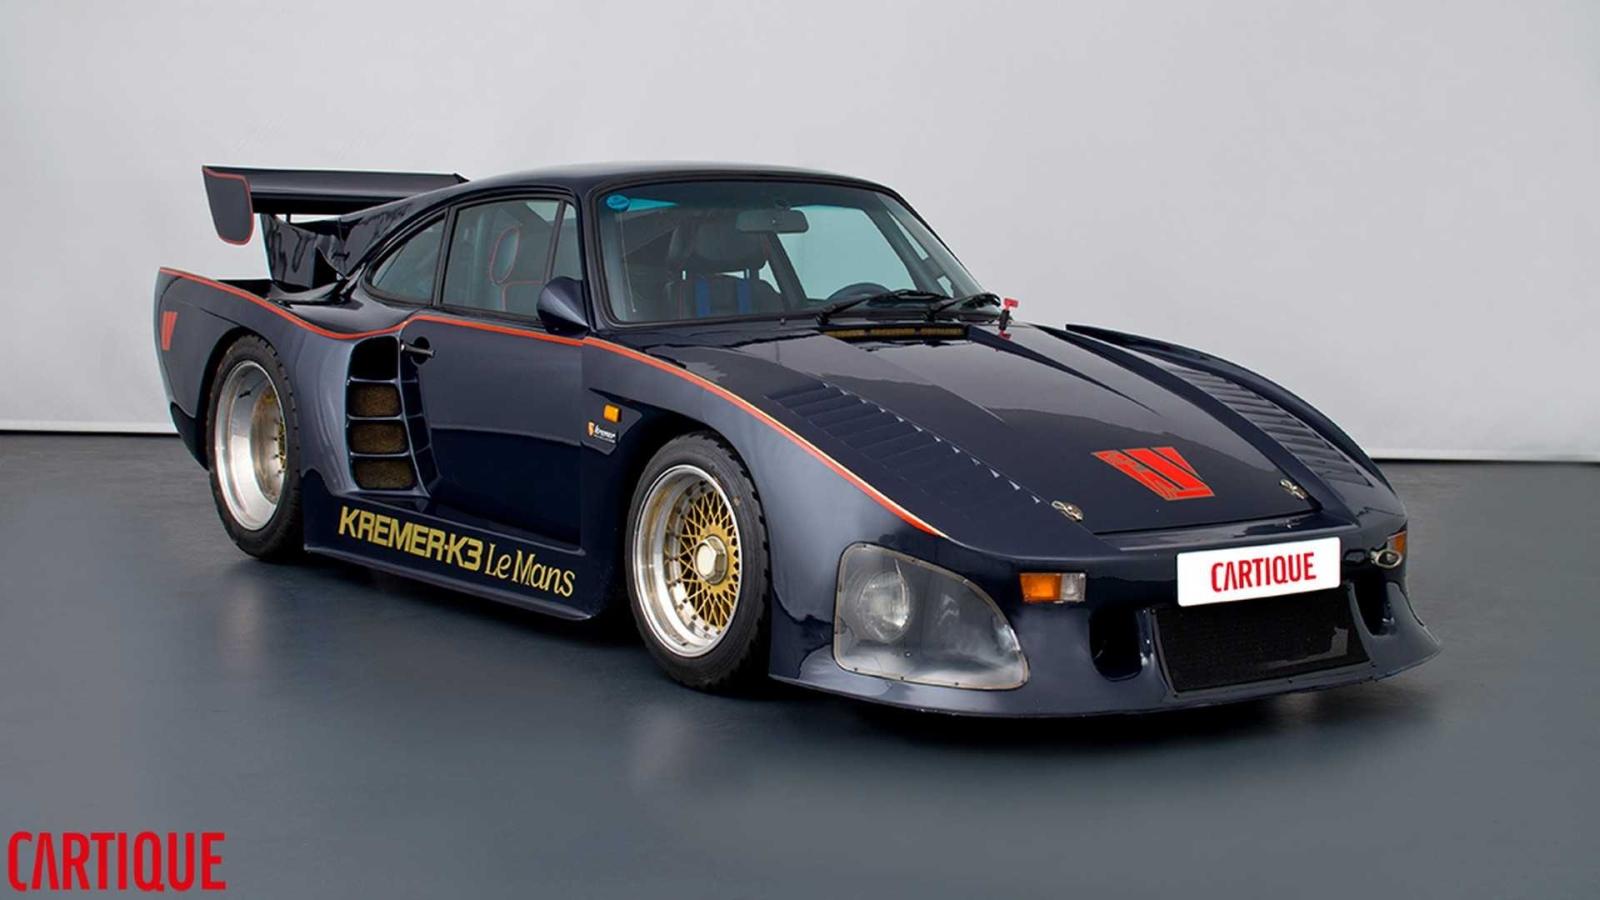 Kremer Porsche K3 Le Mans